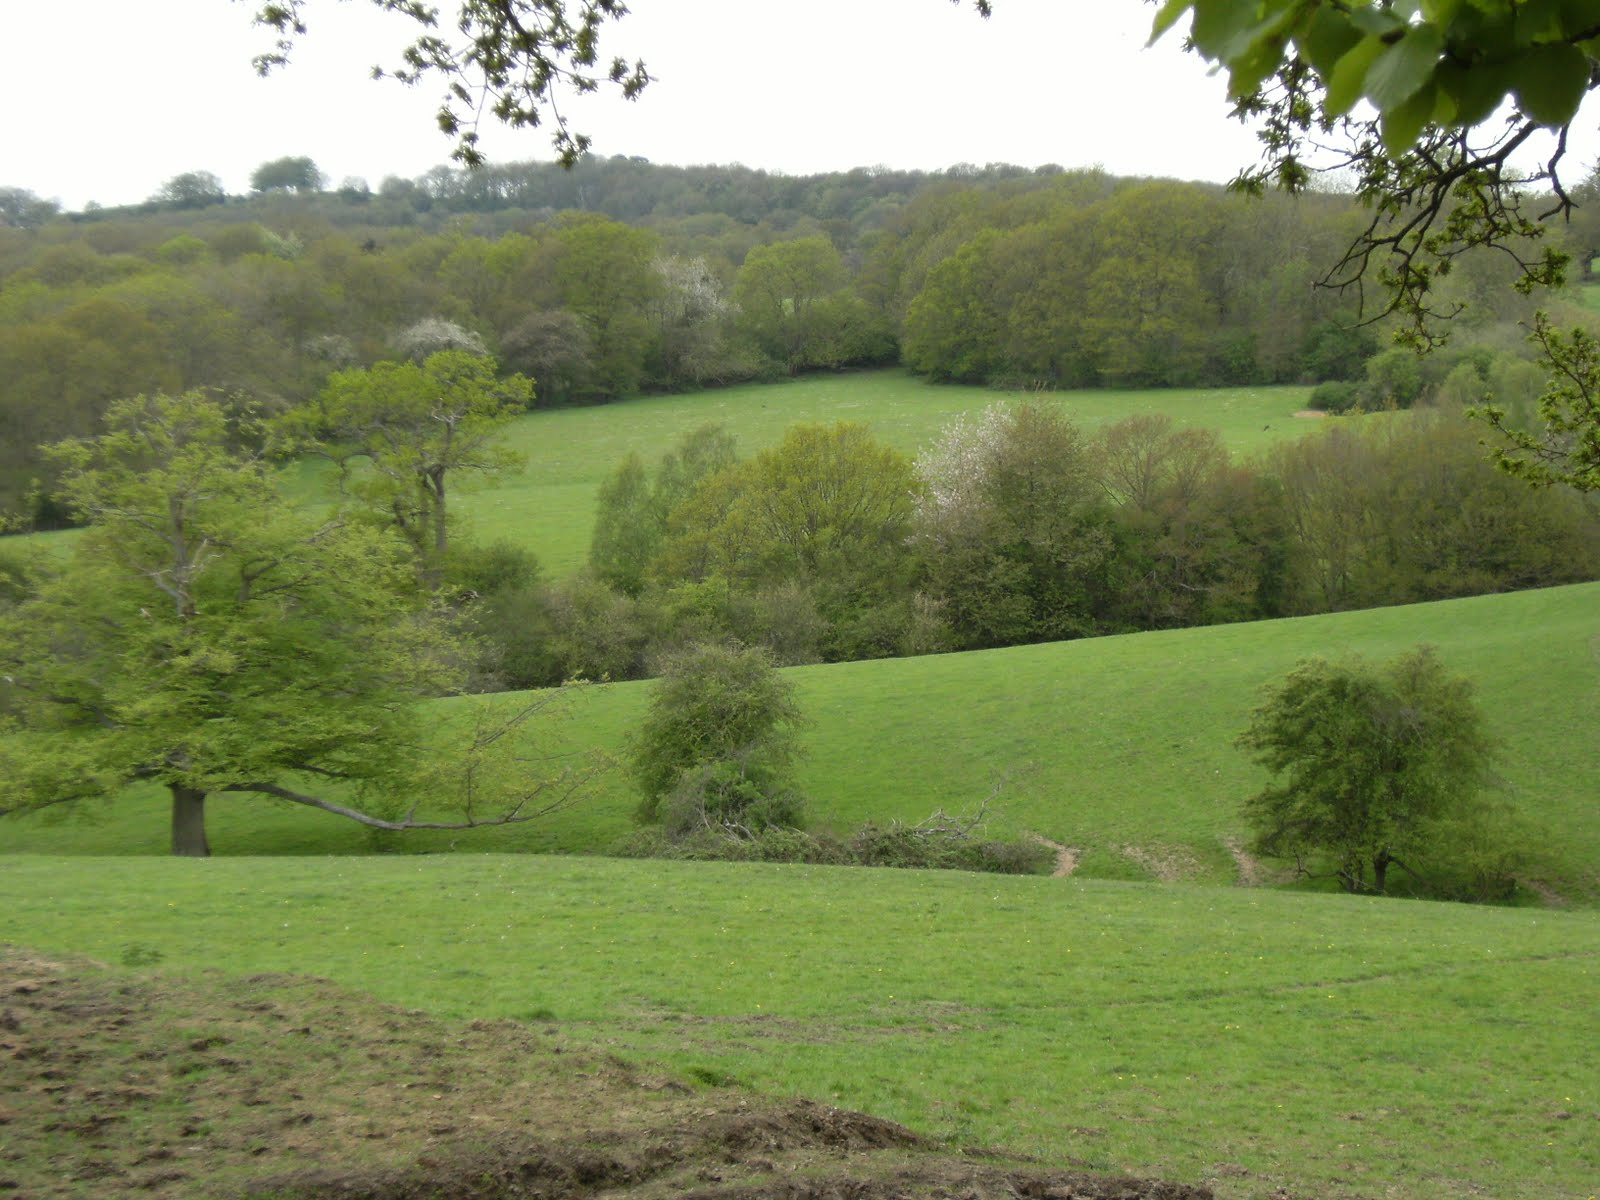 1005050010 Wealden view near Chiddingstone Hoath, spring